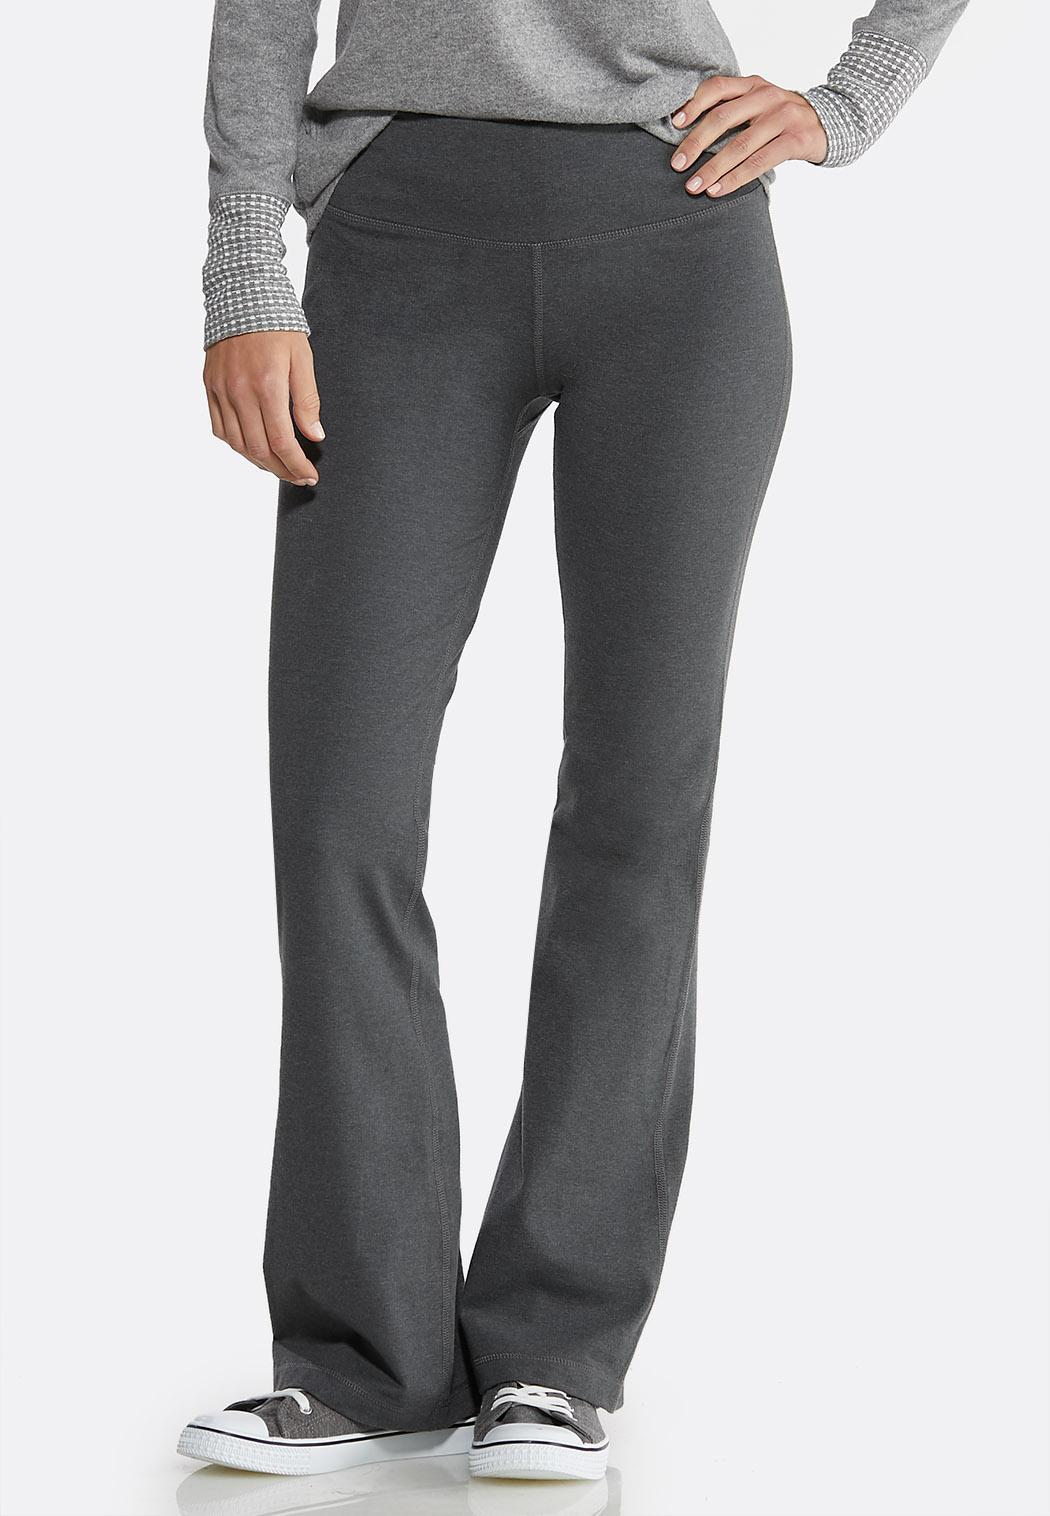 Charcoal Yoga Pants